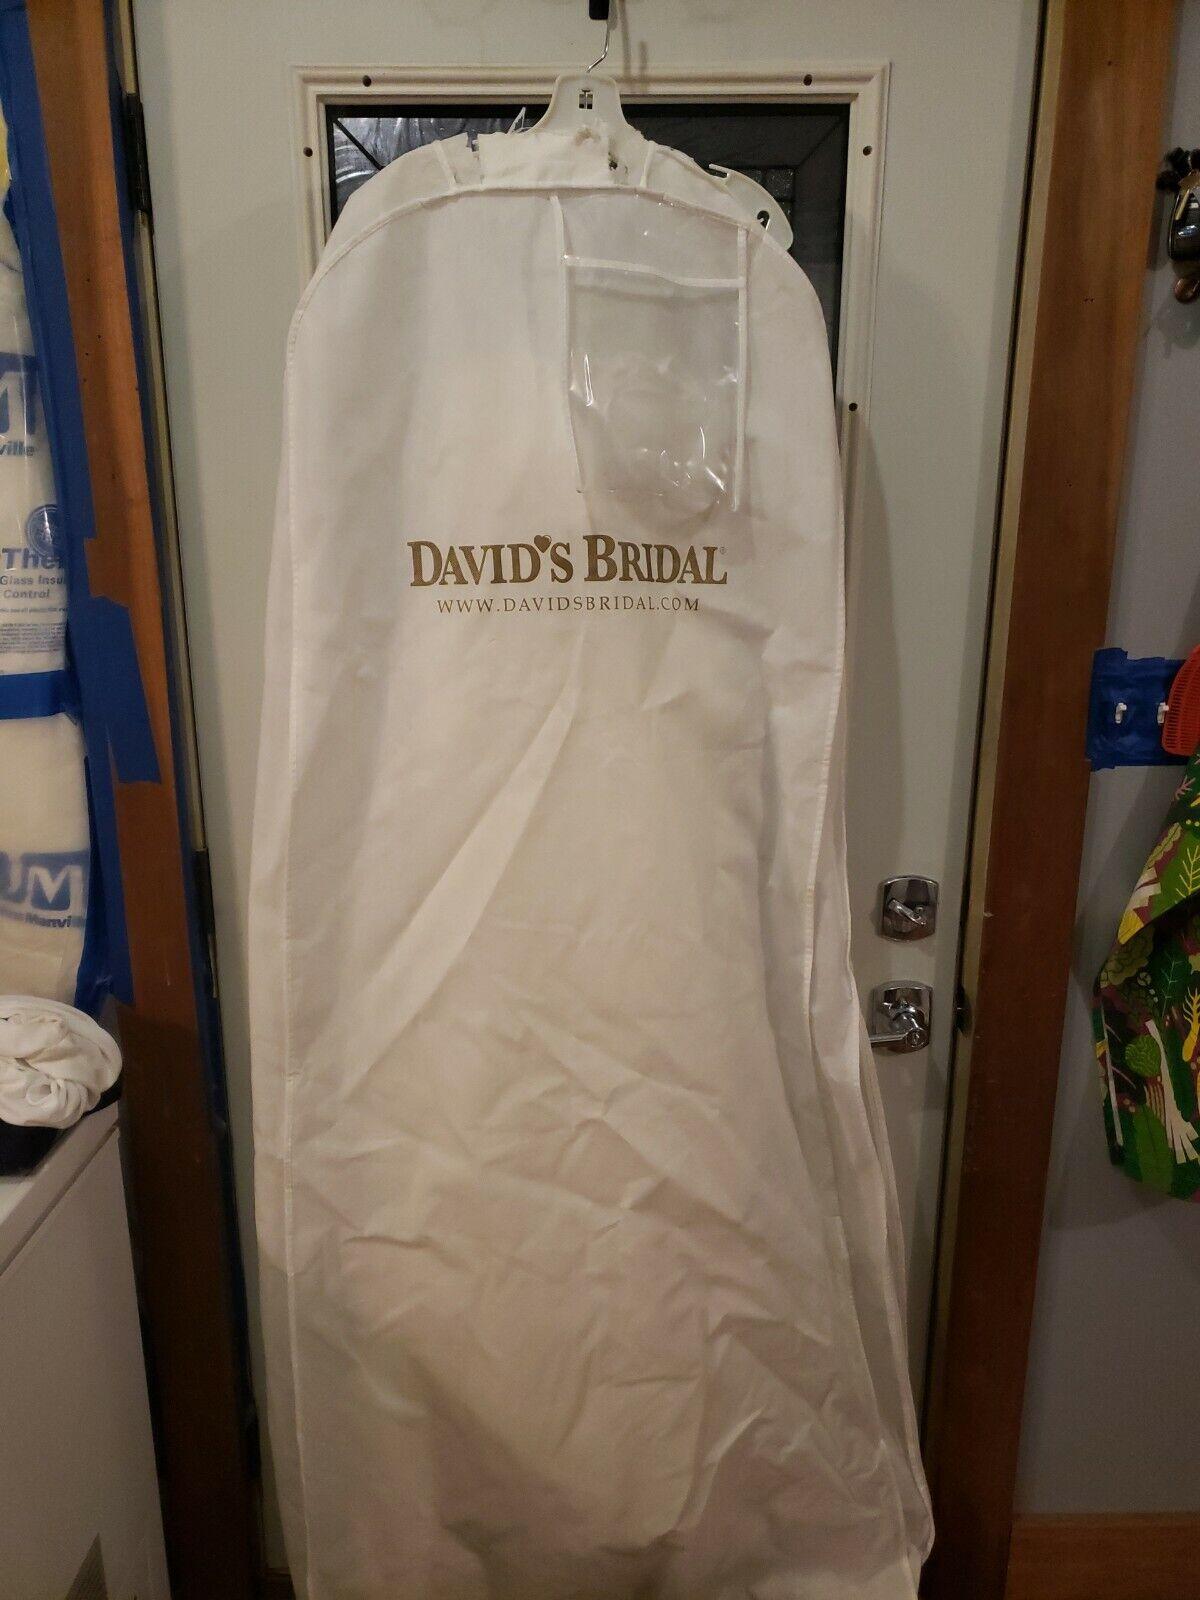 Nwt New Class Style Wedding Dress Size 6 Ivory Halter Davids Bridal Retail